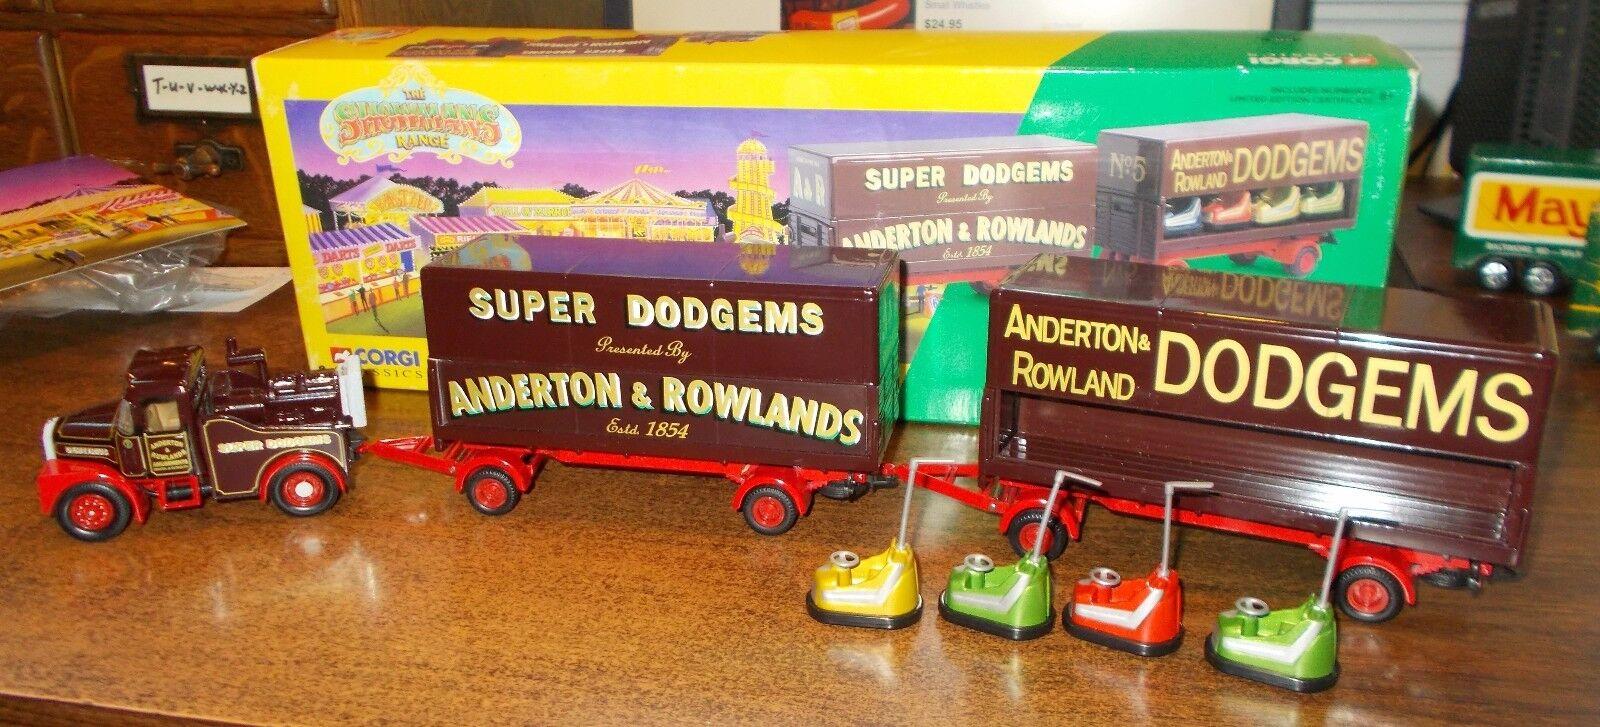 Obtén lo ultimo súper Dodgems Anderton & & & Rowlands Corgi Camión  entrega rápida